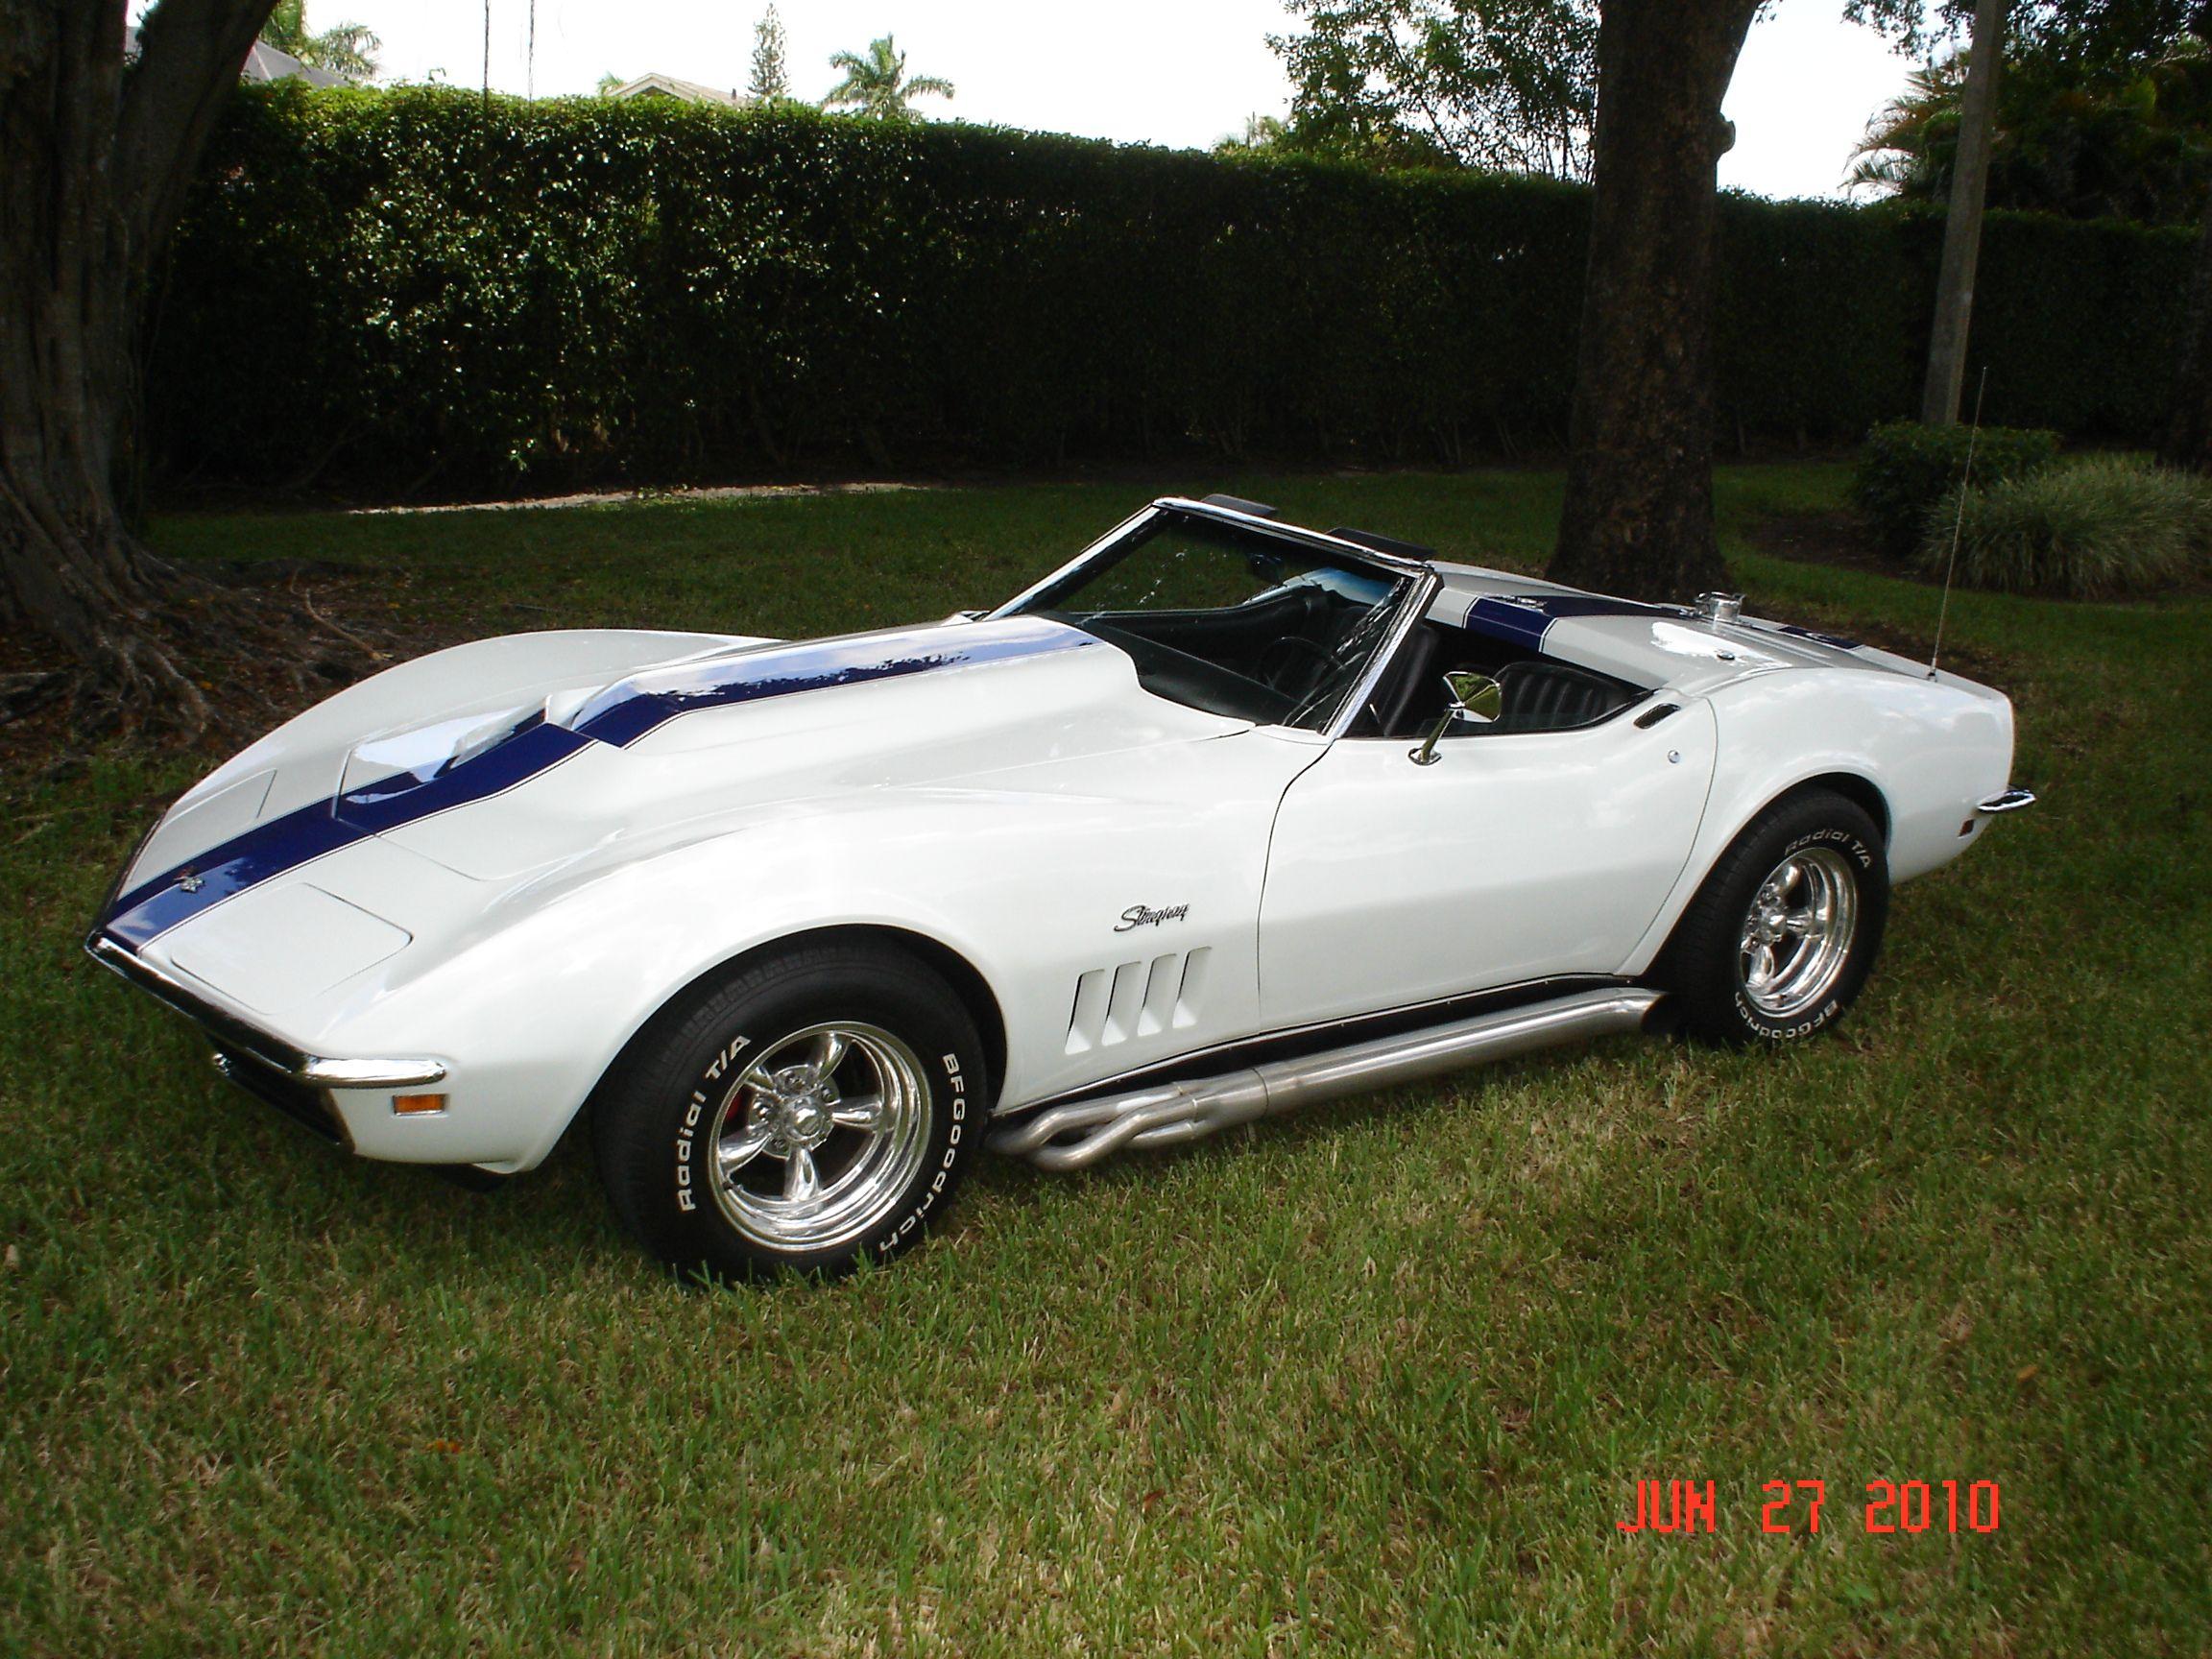 1000 images about 69 corvette stingray on pinterest chevy car - Corvette Stingray 1969 White